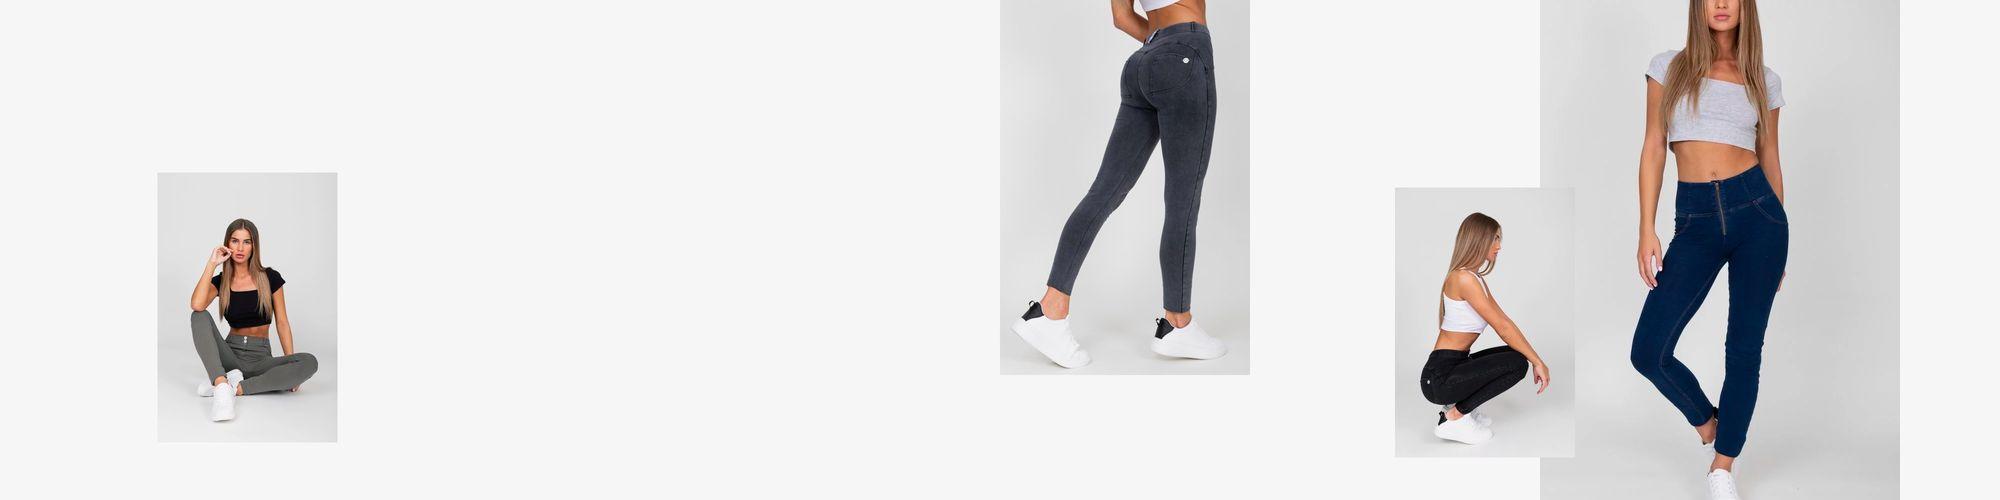 Naskladňujeme Hugz jeans  s push-up efektom!